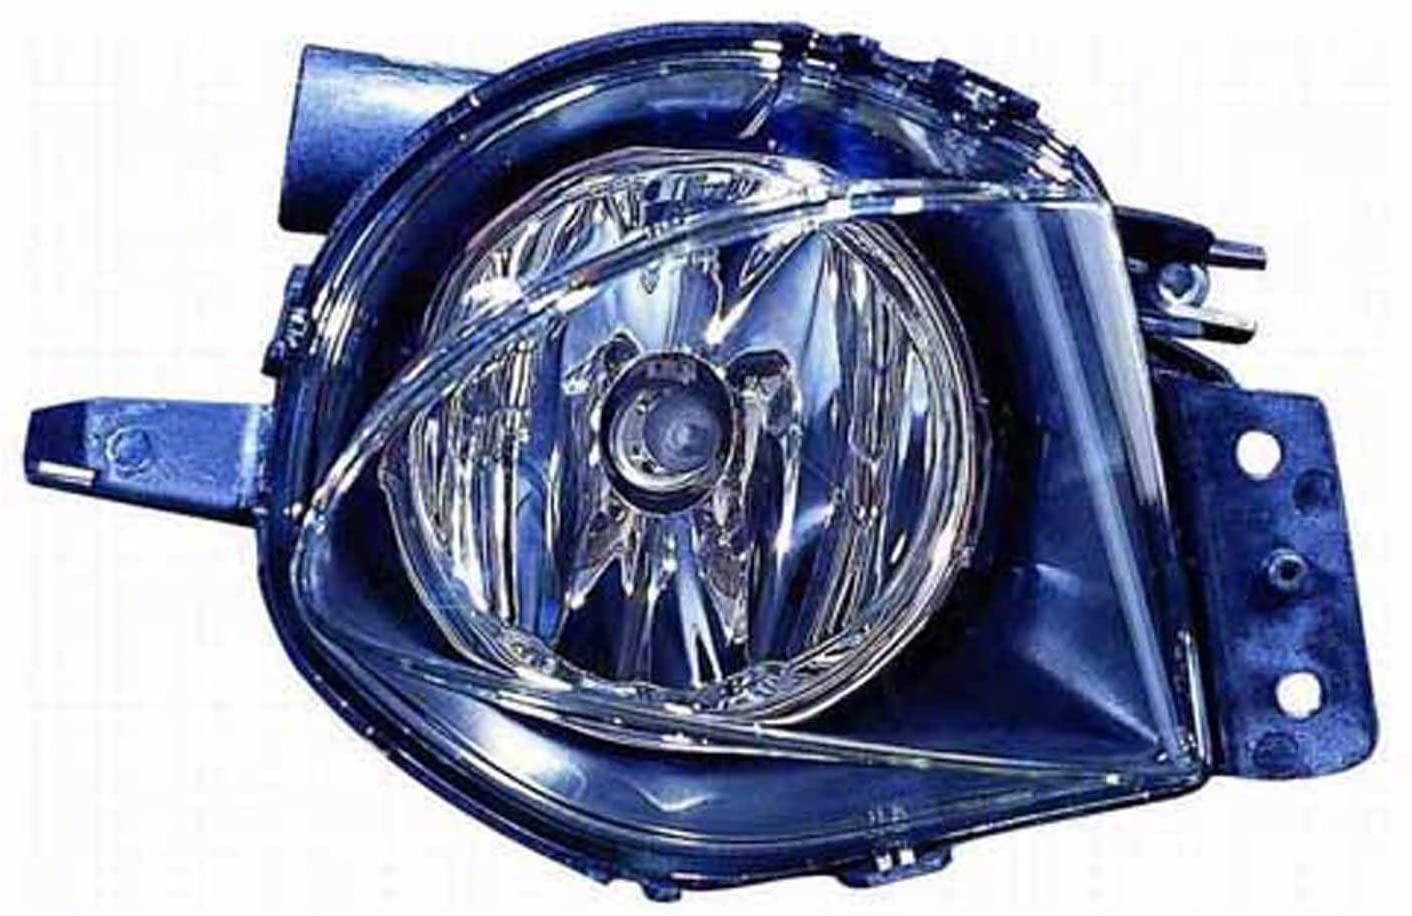 ACK Automotive BMW 3 Fog Light Assembly Replaces Oem: 63 17 6 948 374 Passenger Side